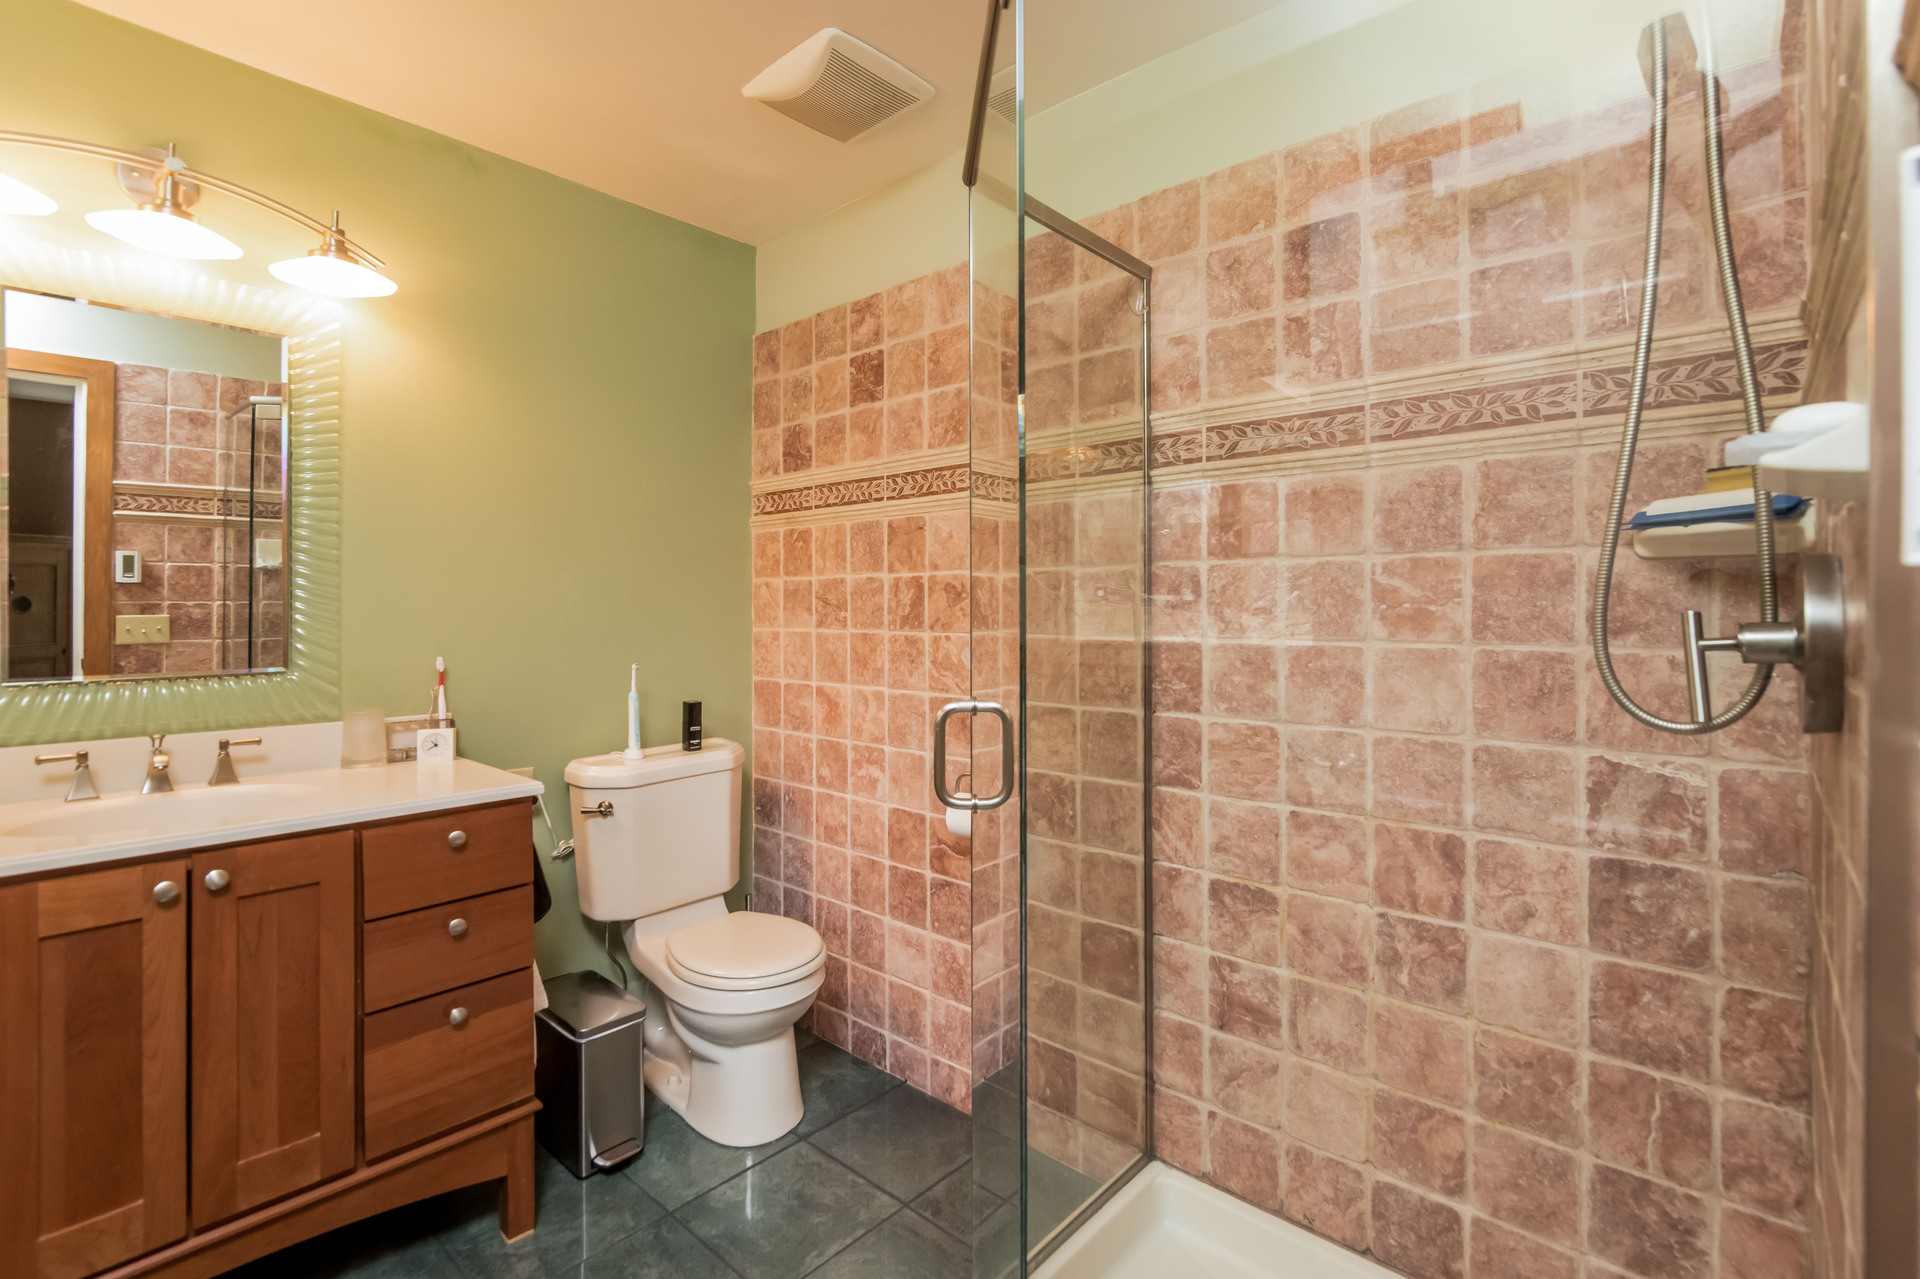 #HGTVStyle | #HGTV | New Master Bath